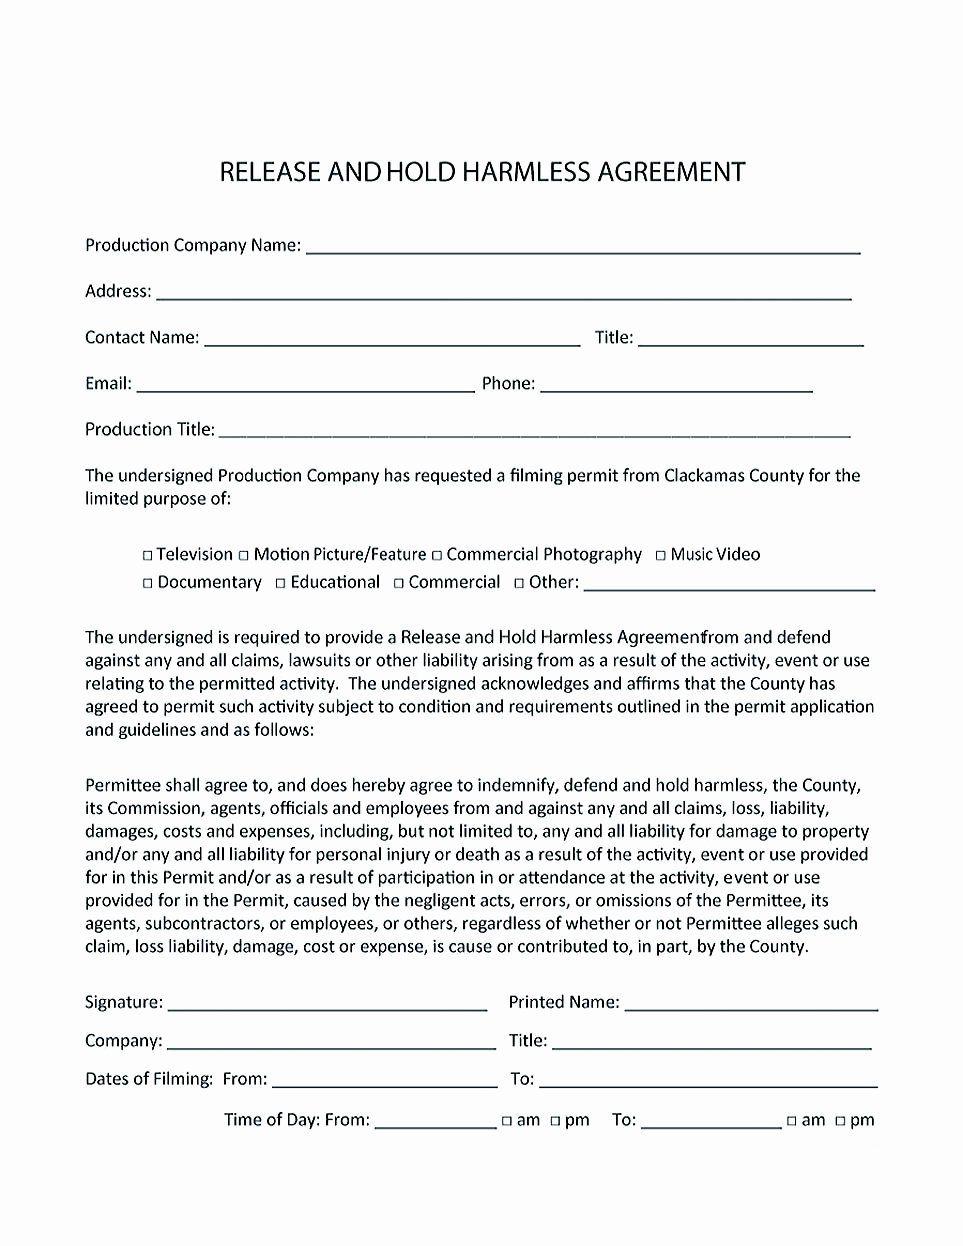 Hold Harmless Agreement Sample Wording Fresh Making Hold Harmless